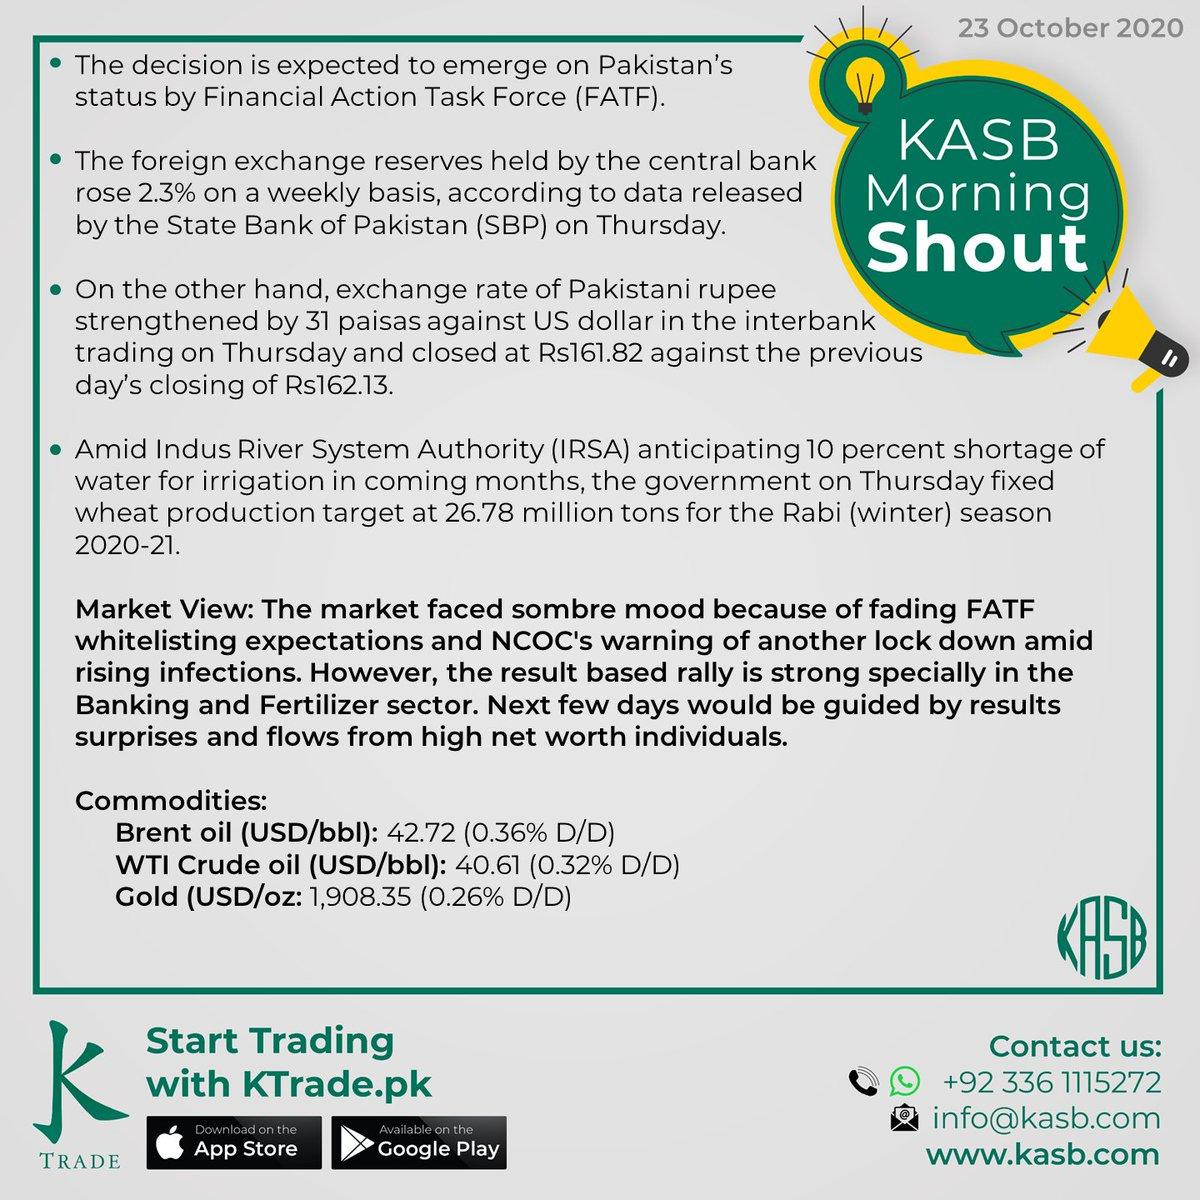 KASB Morning Shout: Our views on today's news #kasb #smartinvesting #psx #stockmarket #KTrade #onlinetrading #pakistaneconomy #imrankhan #sbp #inflation #kse100 #brokeragehouse #psxstocks #marketupdate #emergingmarkets #frontiermarkets #news #morning #today #views https://t.co/Vewjp3D1Jp